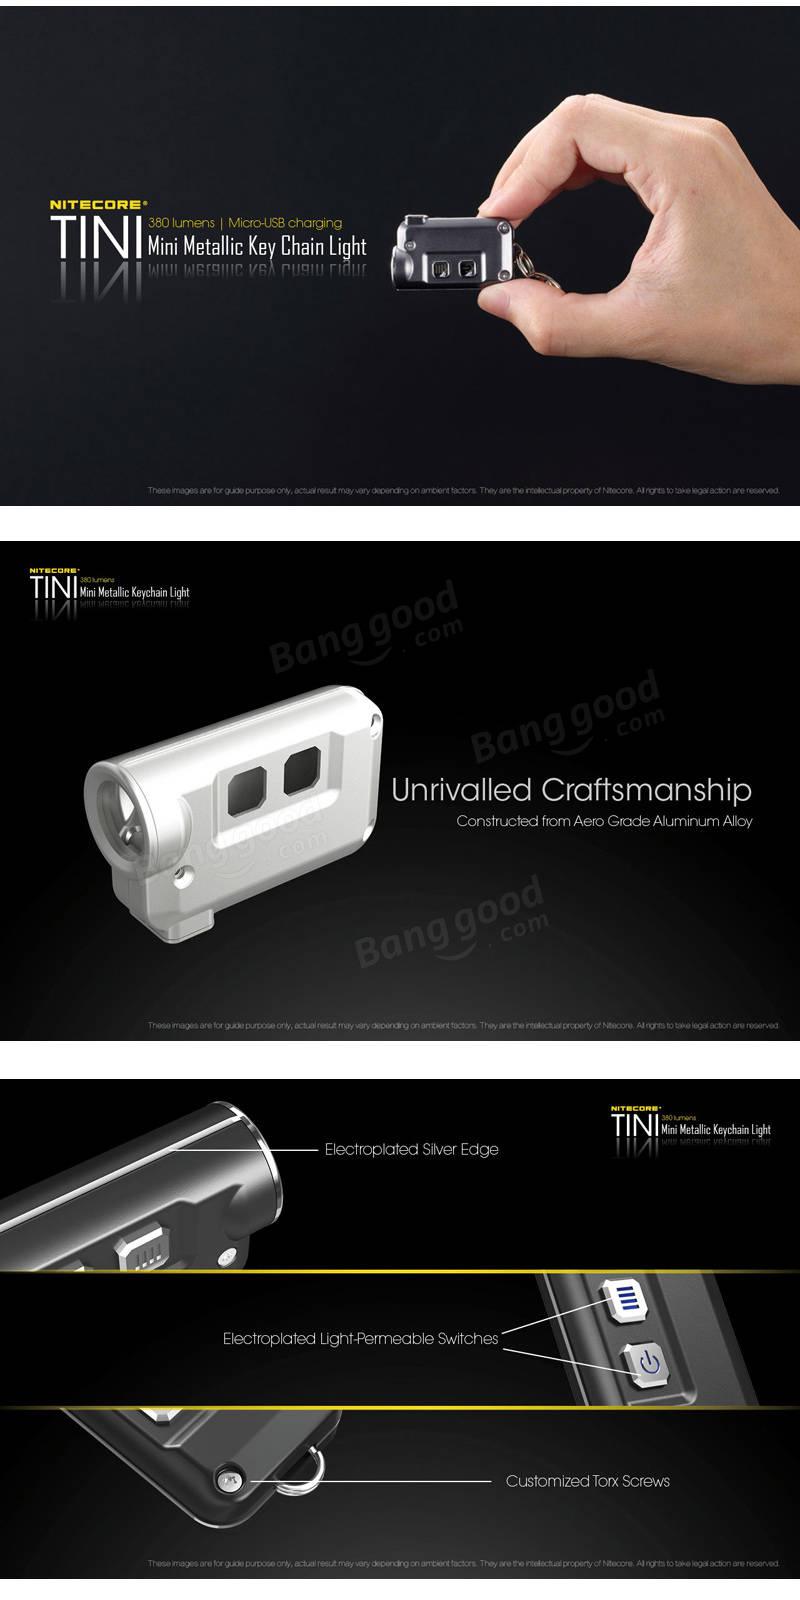 Nitecore TINI XP-G2 S3 380LM 4Modes USB Rechargeable Mini Metallic Keychain Light